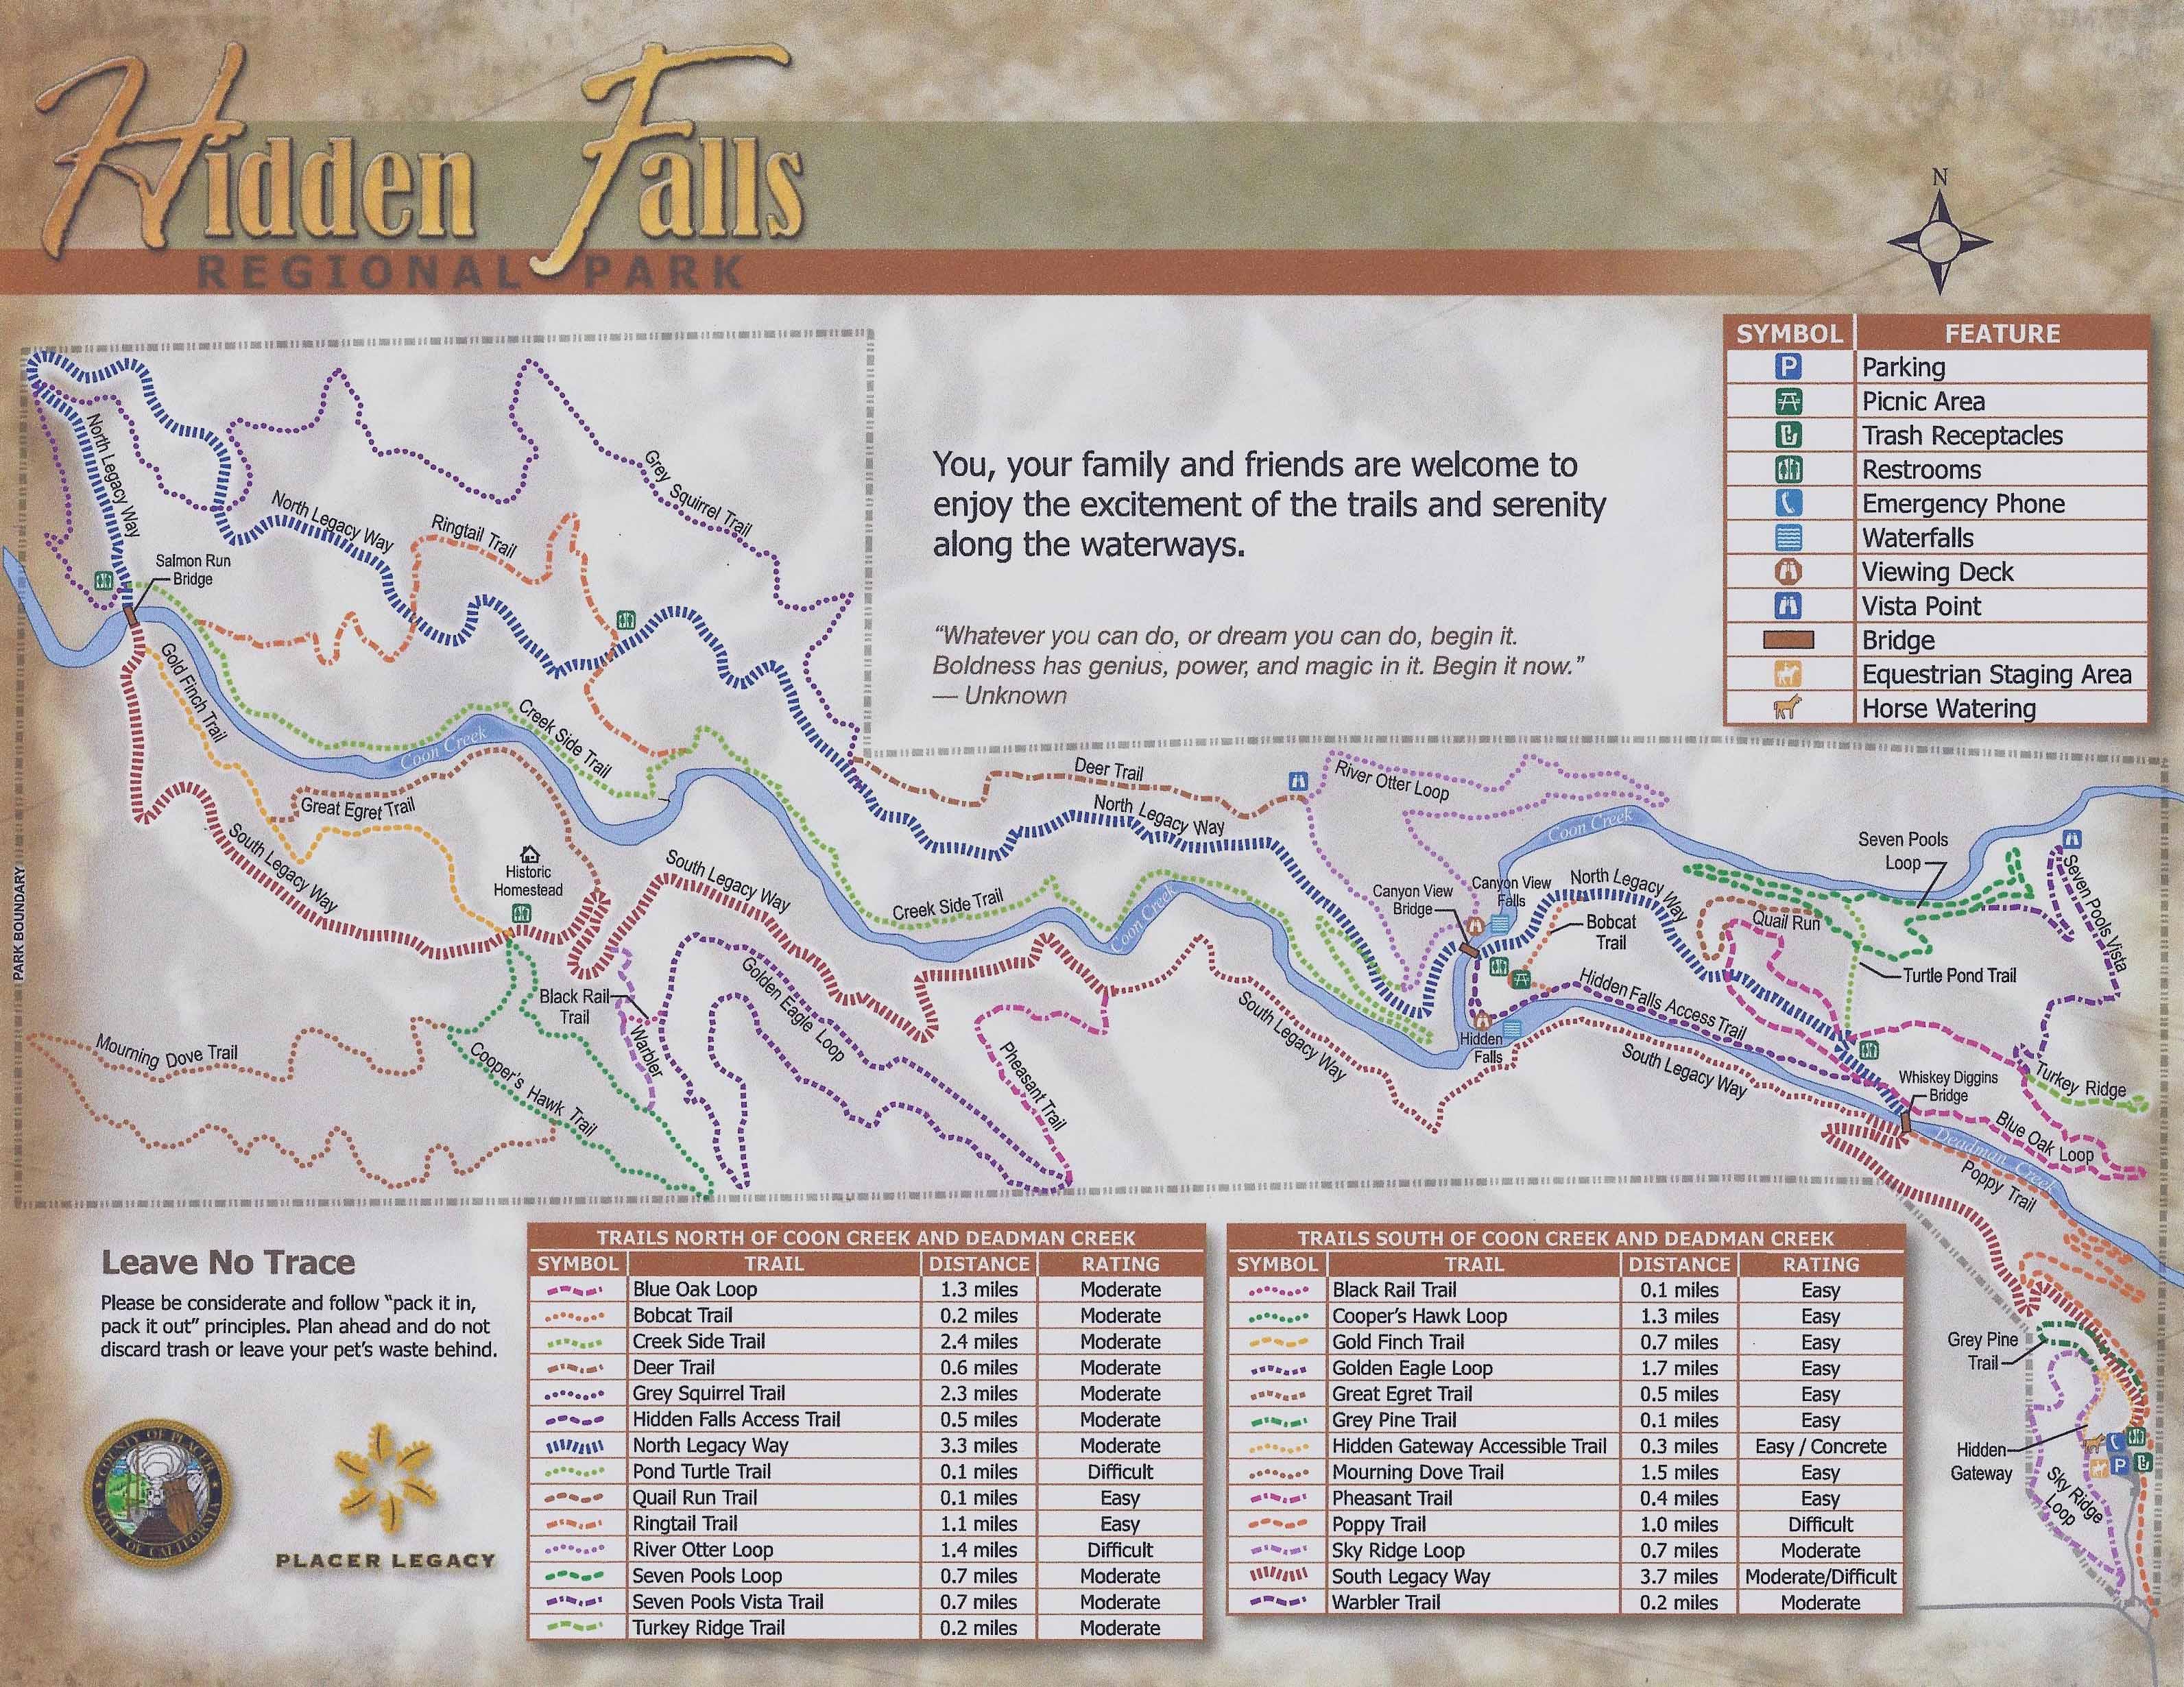 Hidden Falls Regional Park | Get Off Your G on hidden falls hike auburn ca, hidden falls park auburn california, hidden falls adventure park trail map,